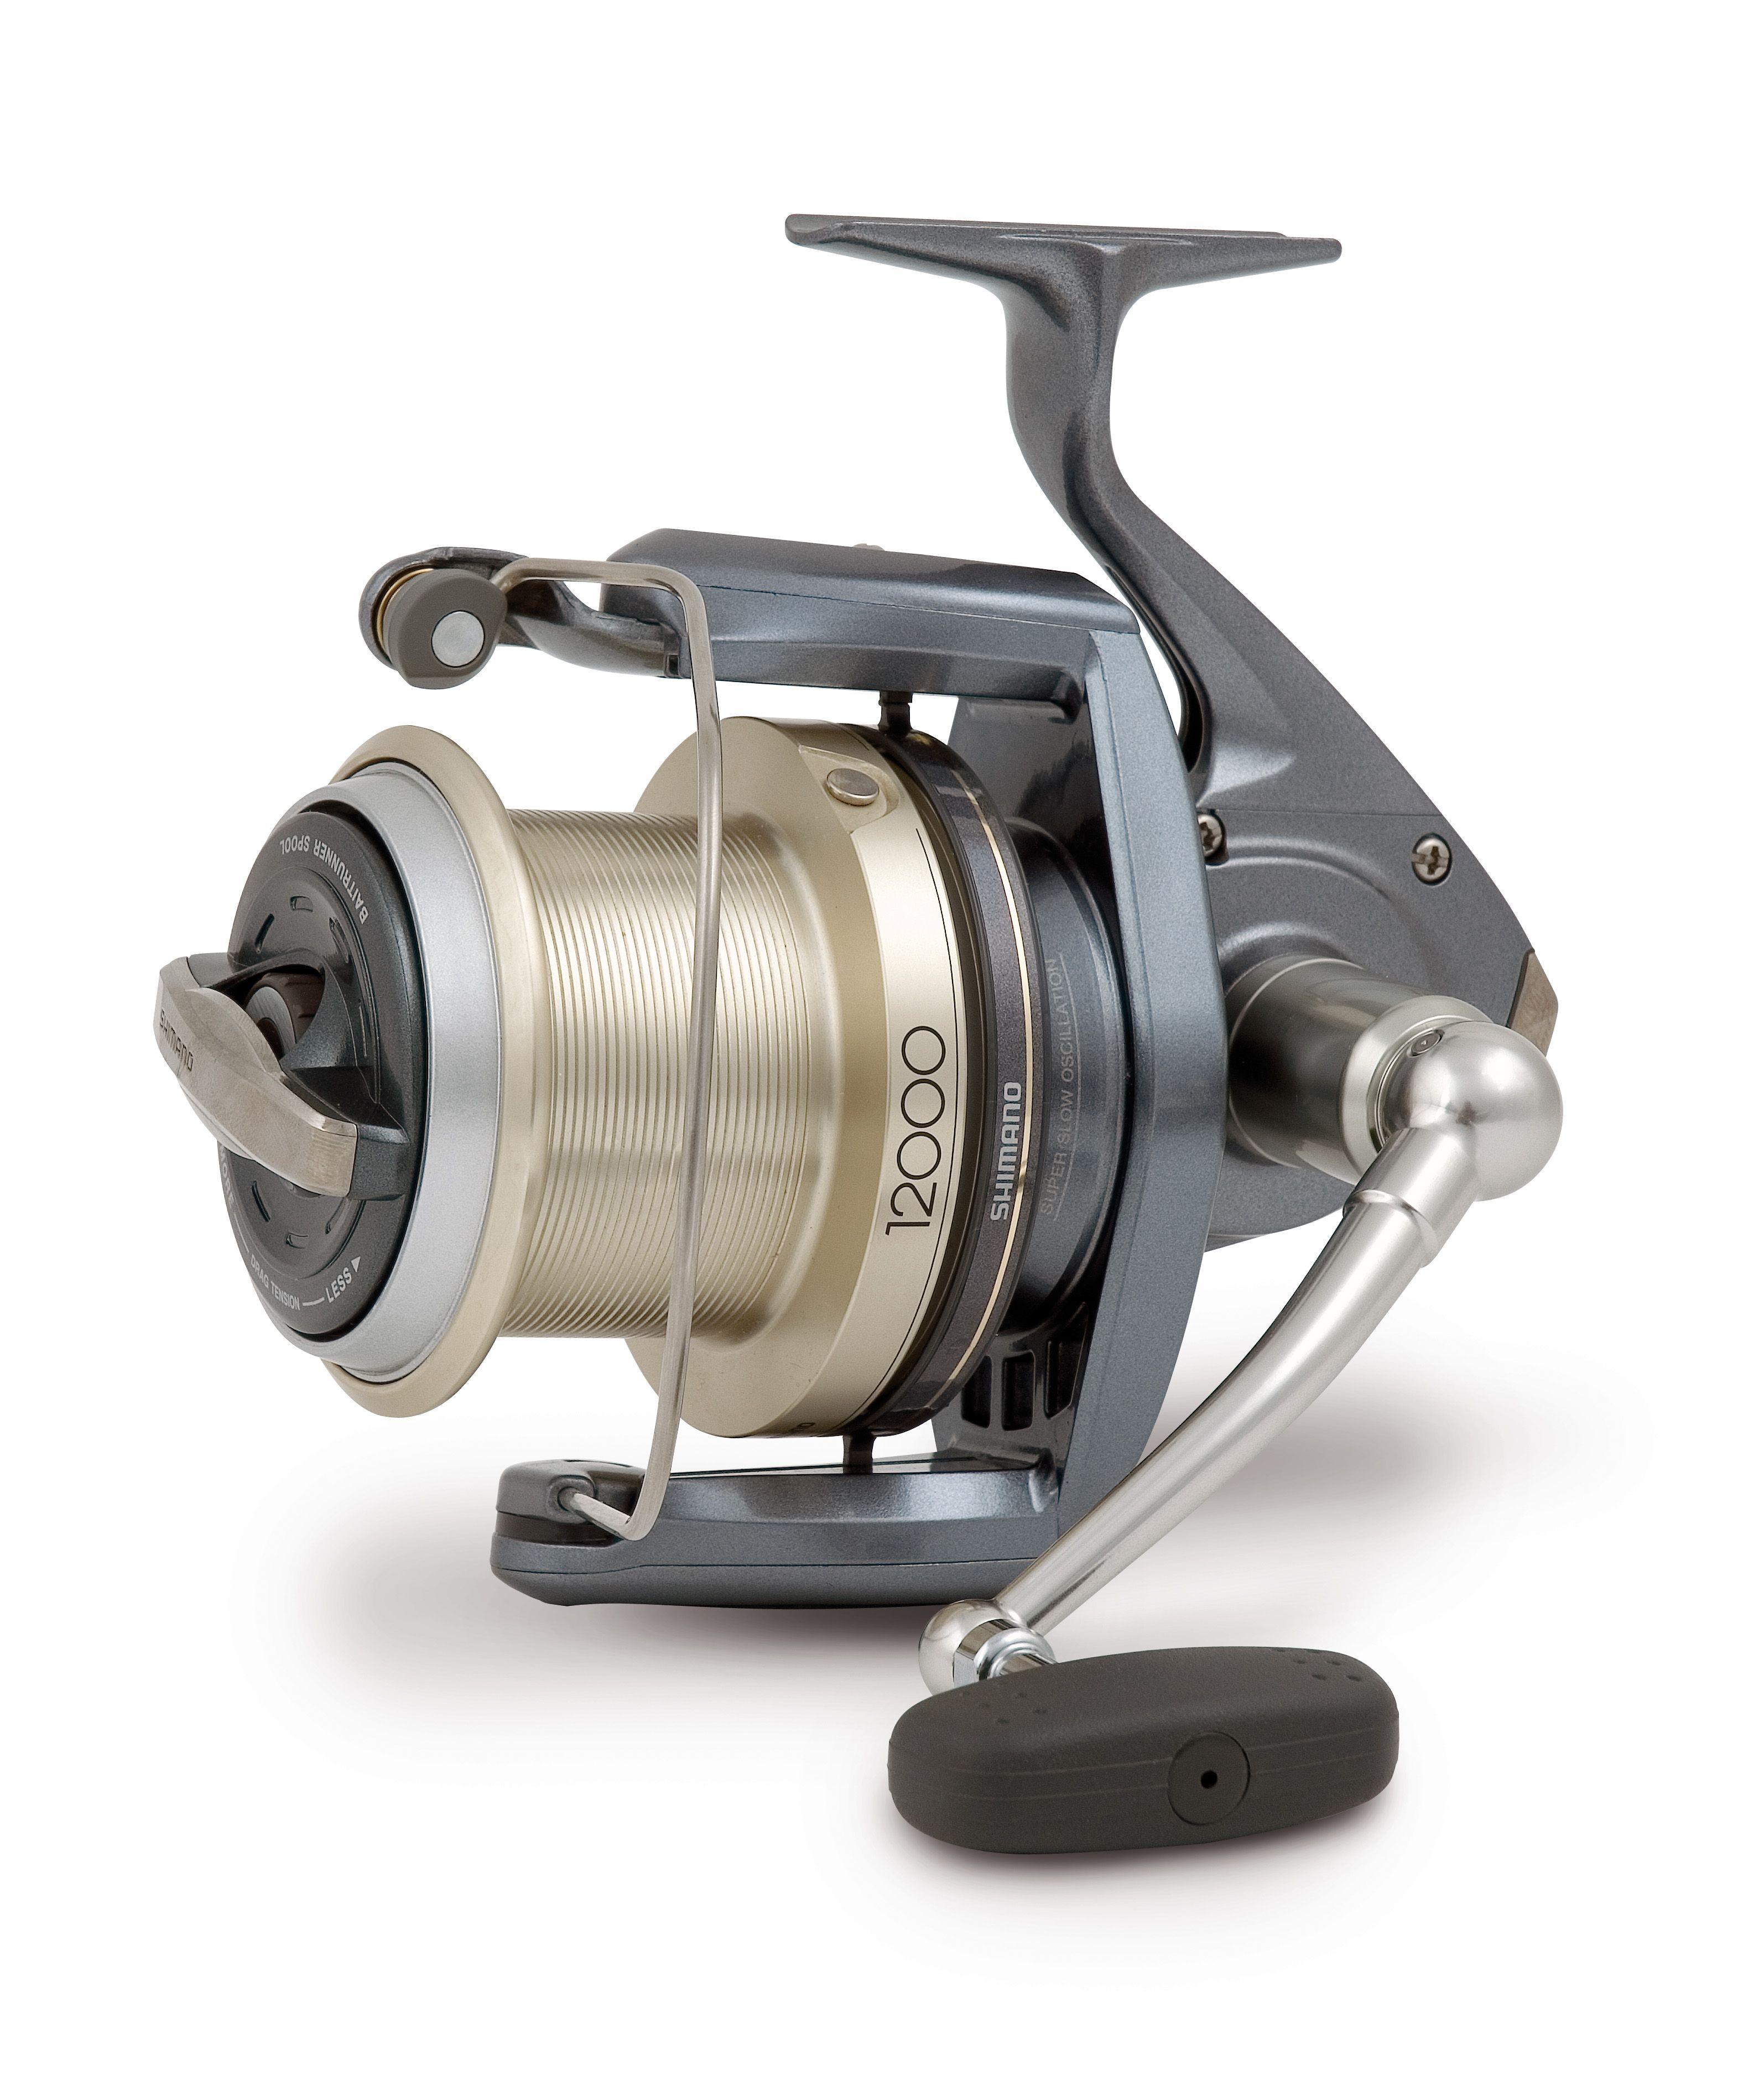 13a0ec6062a Shimano - Aero Technium XT Carp Fishing, Fishing Lures, Shimano Fishing,  Fishing Tackle